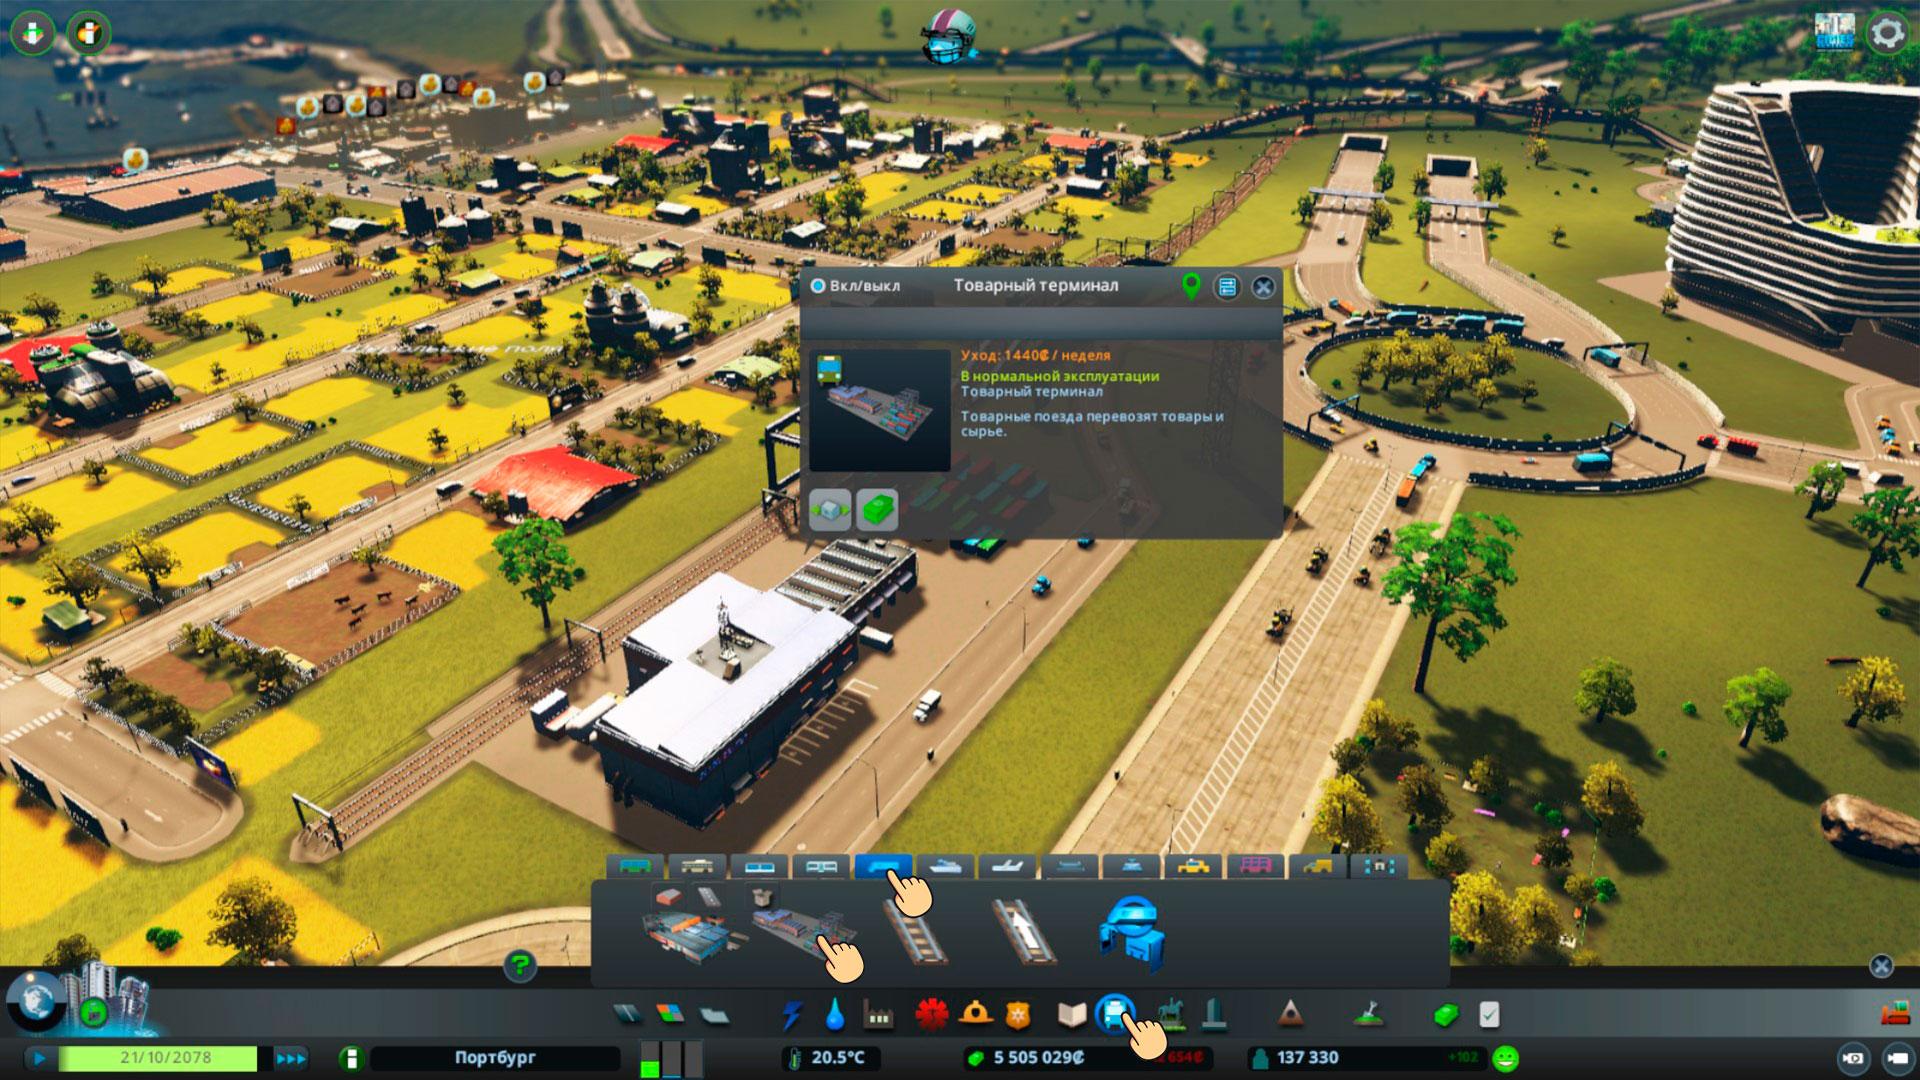 Товарный терминал cities skylines